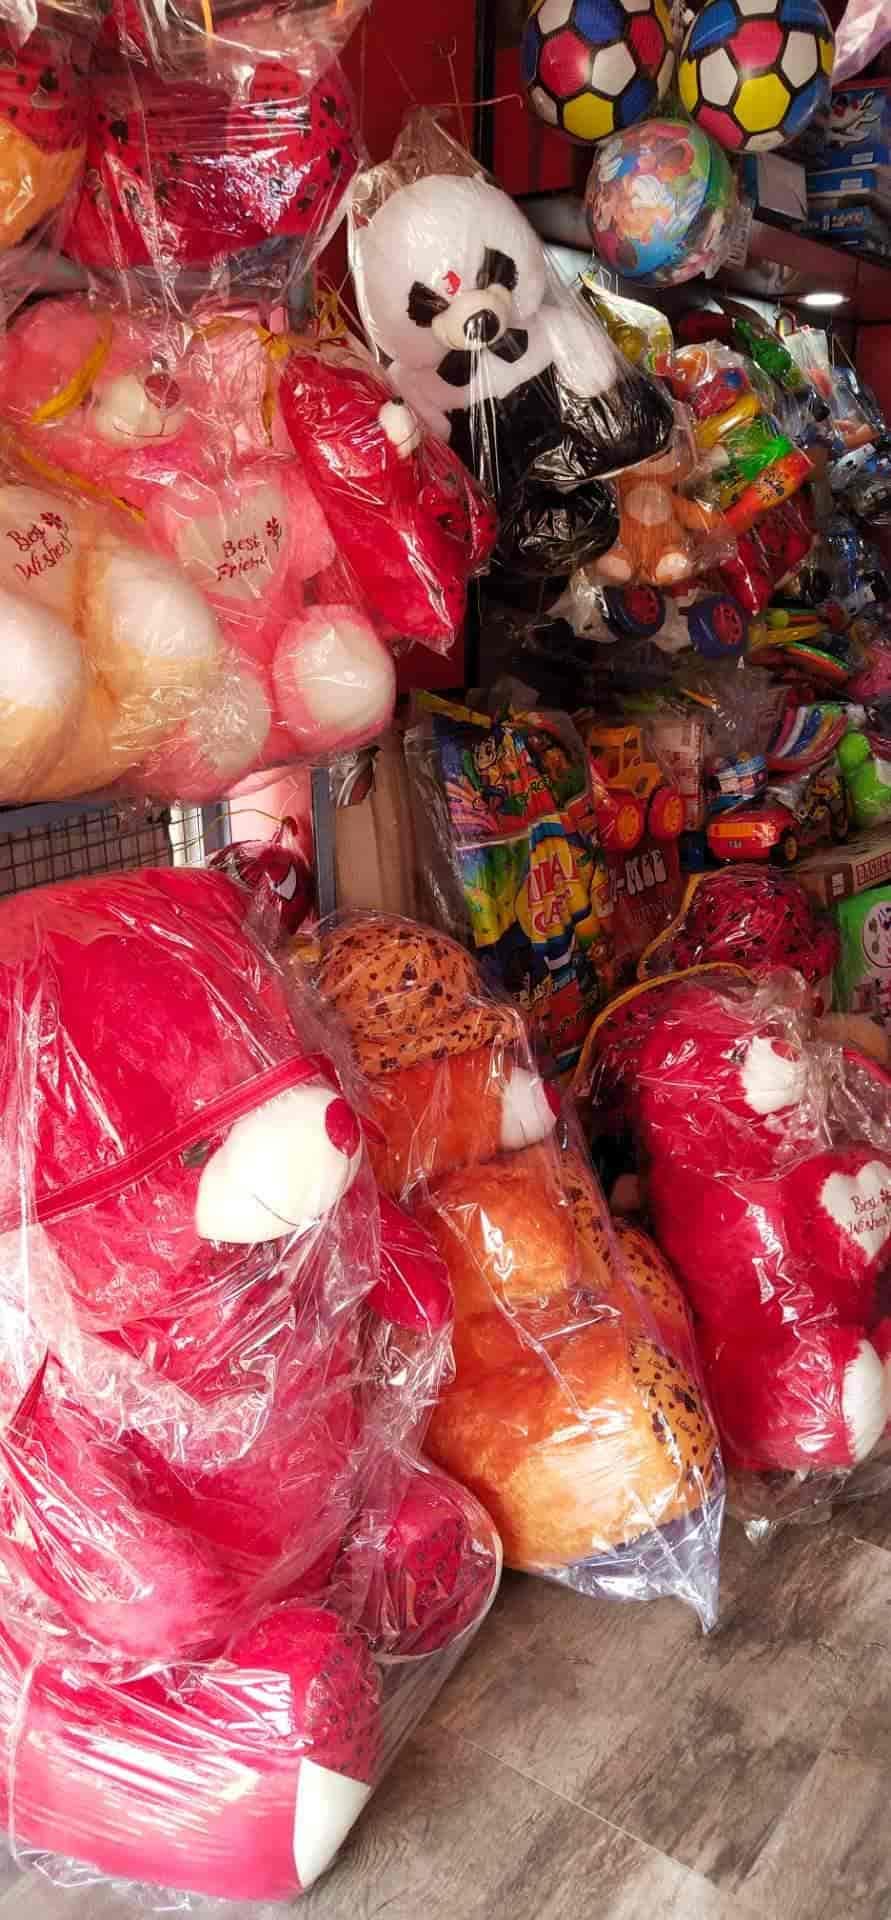 Mehta Gift Gallery, Sadar Bazar - Gift Shops in Gurgaon